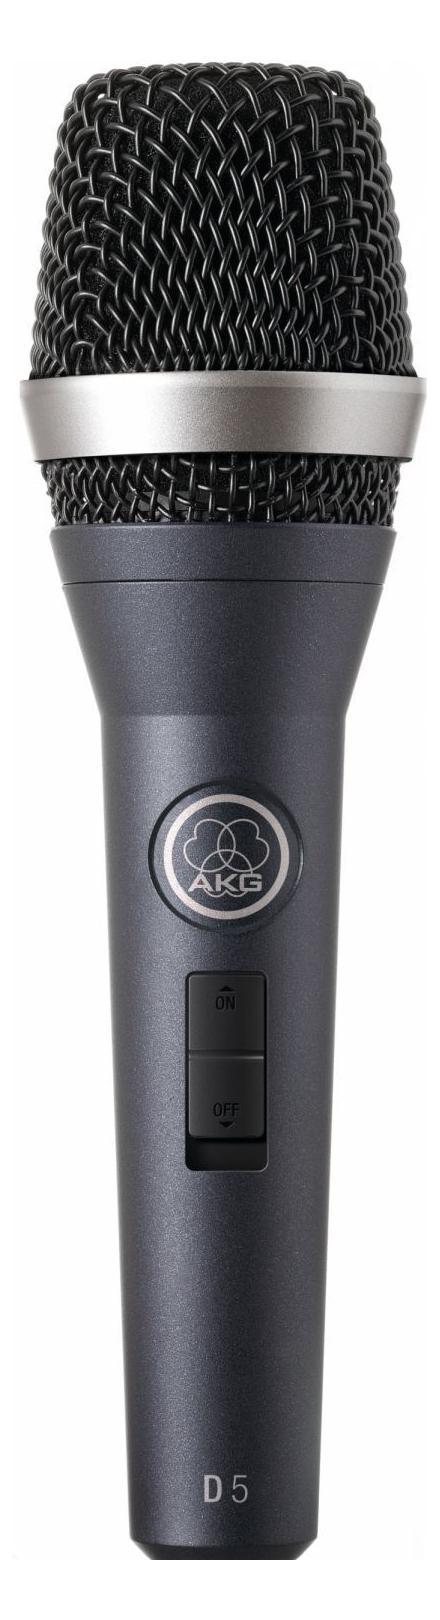 Mikrofone - AKG D5 S - Onlineshop Musikhaus Kirstein